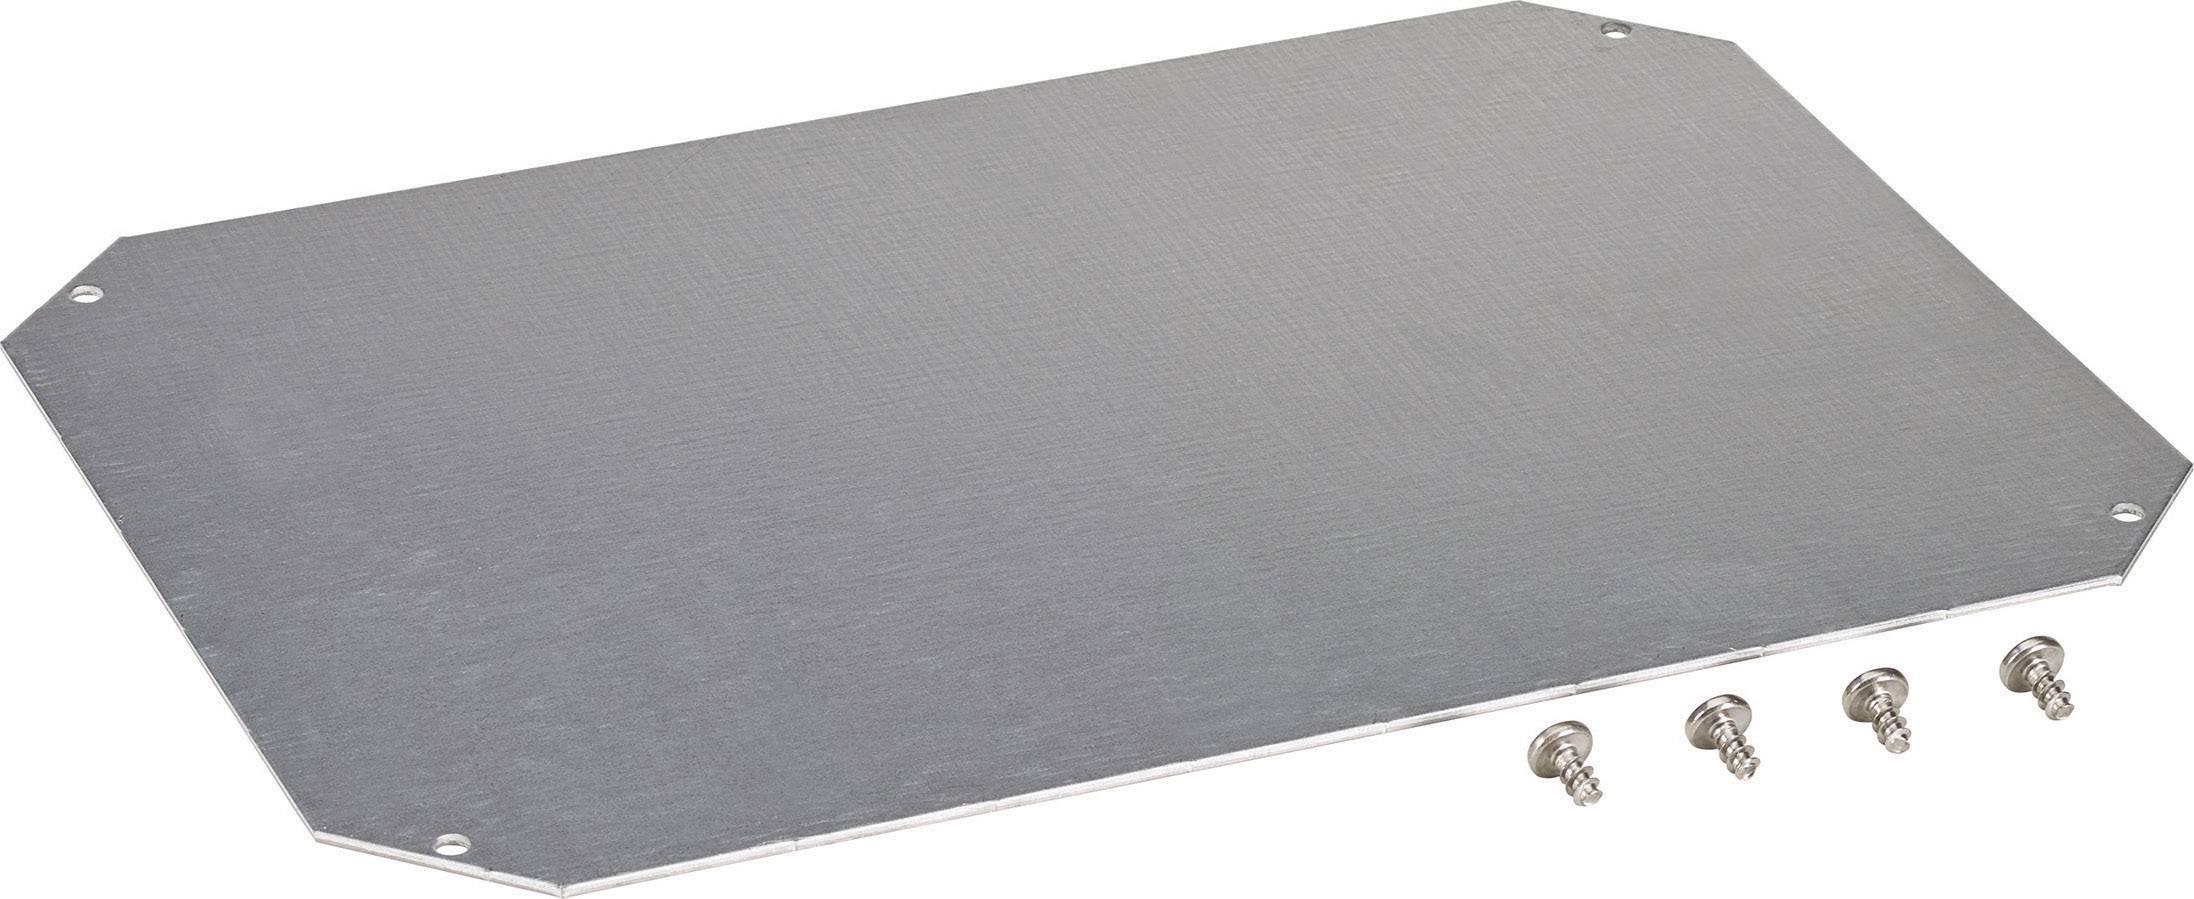 Montážní deska Fibox ARCA 8120733, (d x š) 400 mm x 300 mm, ocelový plech, 1 ks